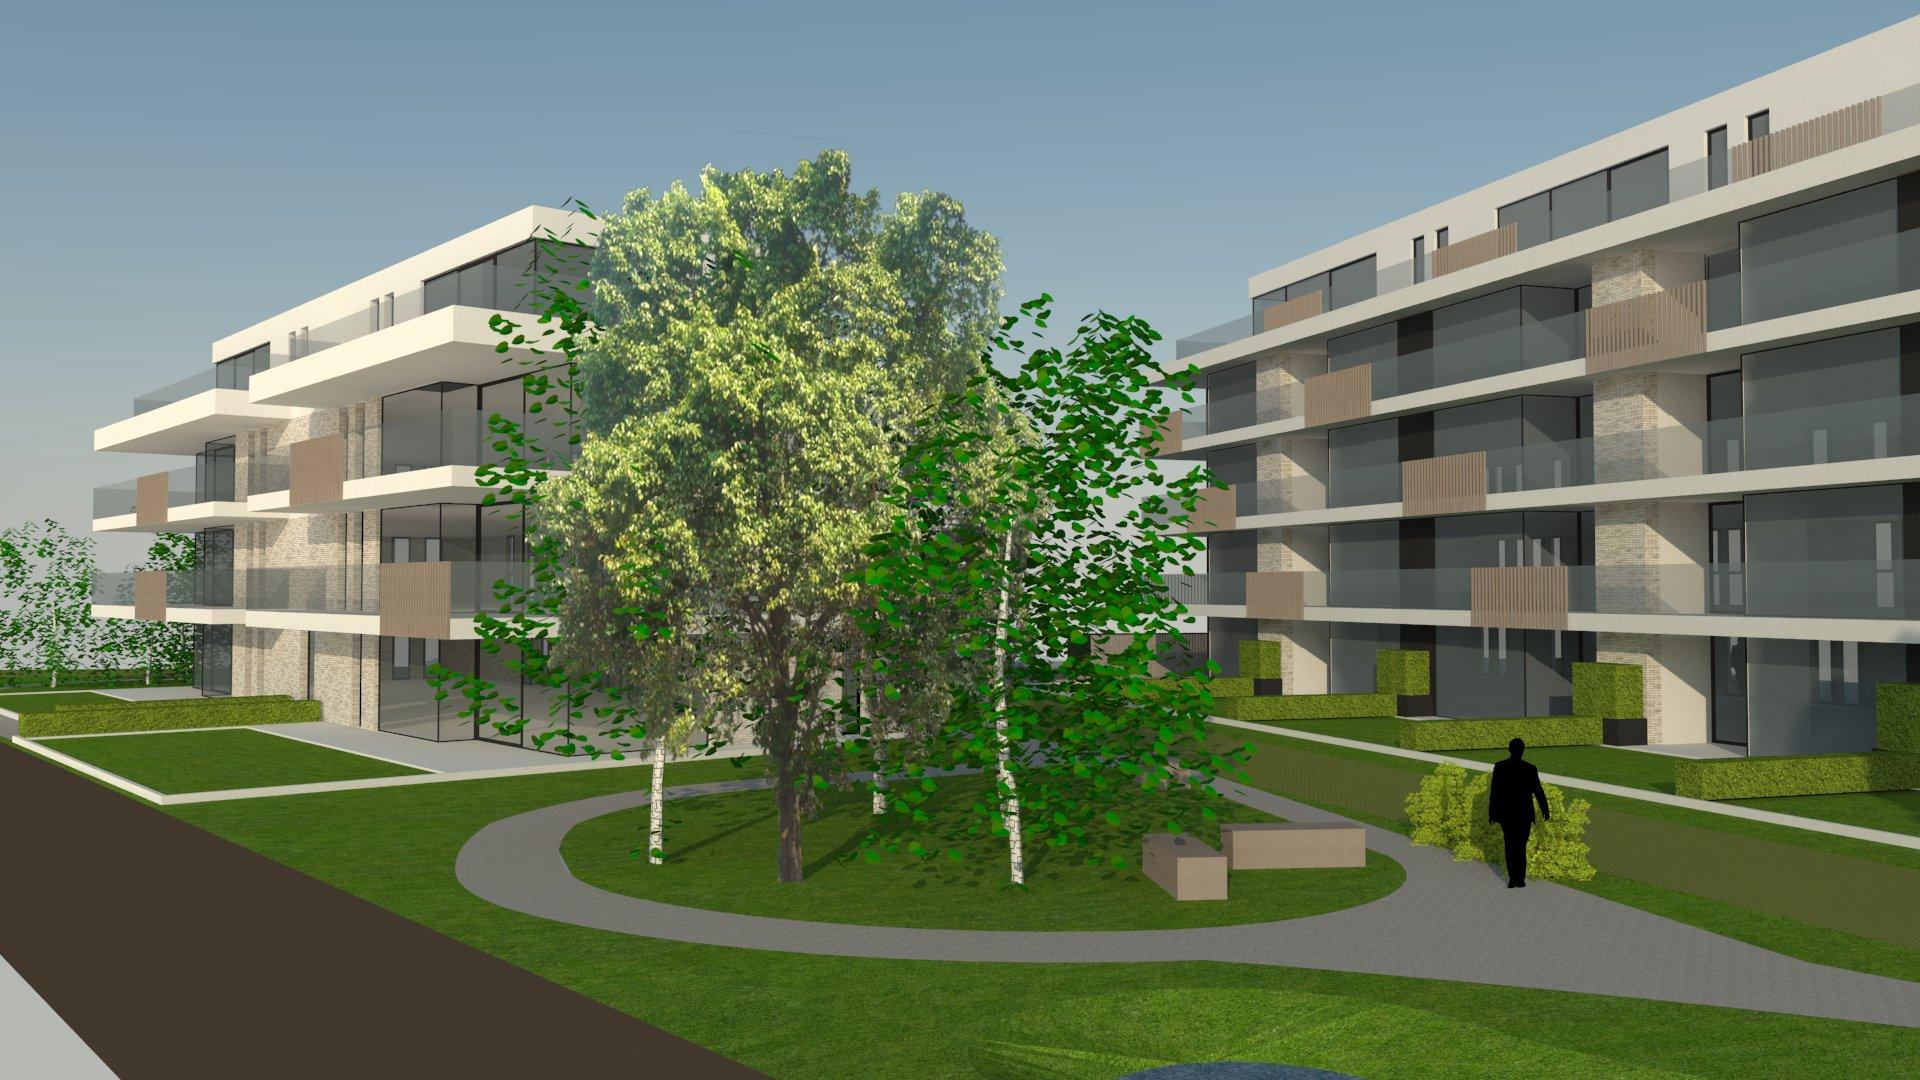 BA_bouwen appartementen na afbraak_171146_3D_N_02.jpg